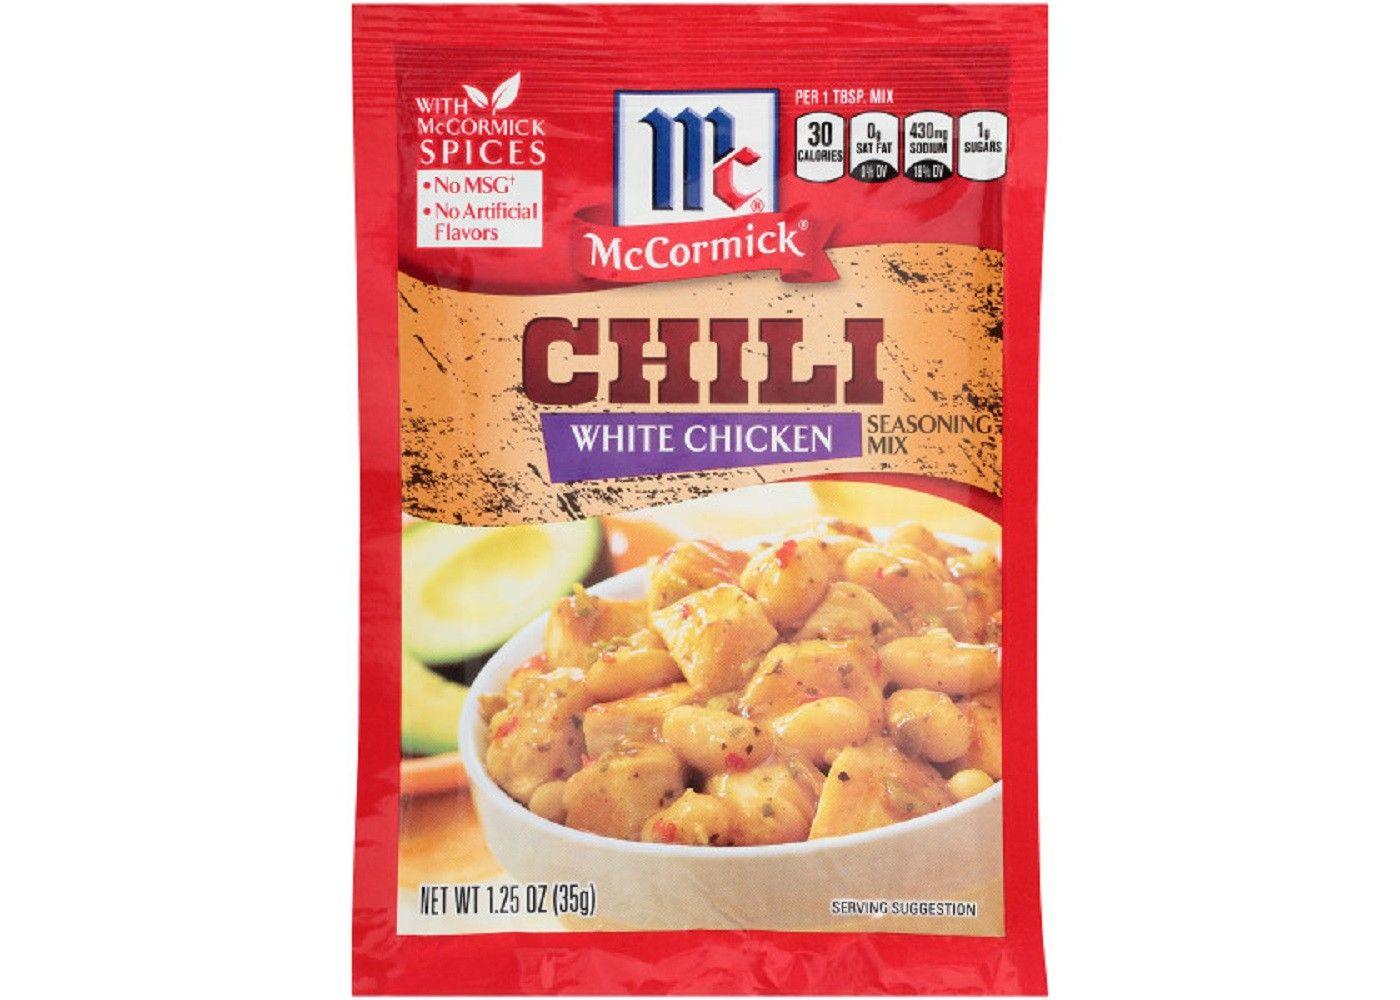 Mccormick White Chicken Chili Seasoning Mix 1 25oz White Chicken Chili Mccormick White Chicken Chili White Chicken